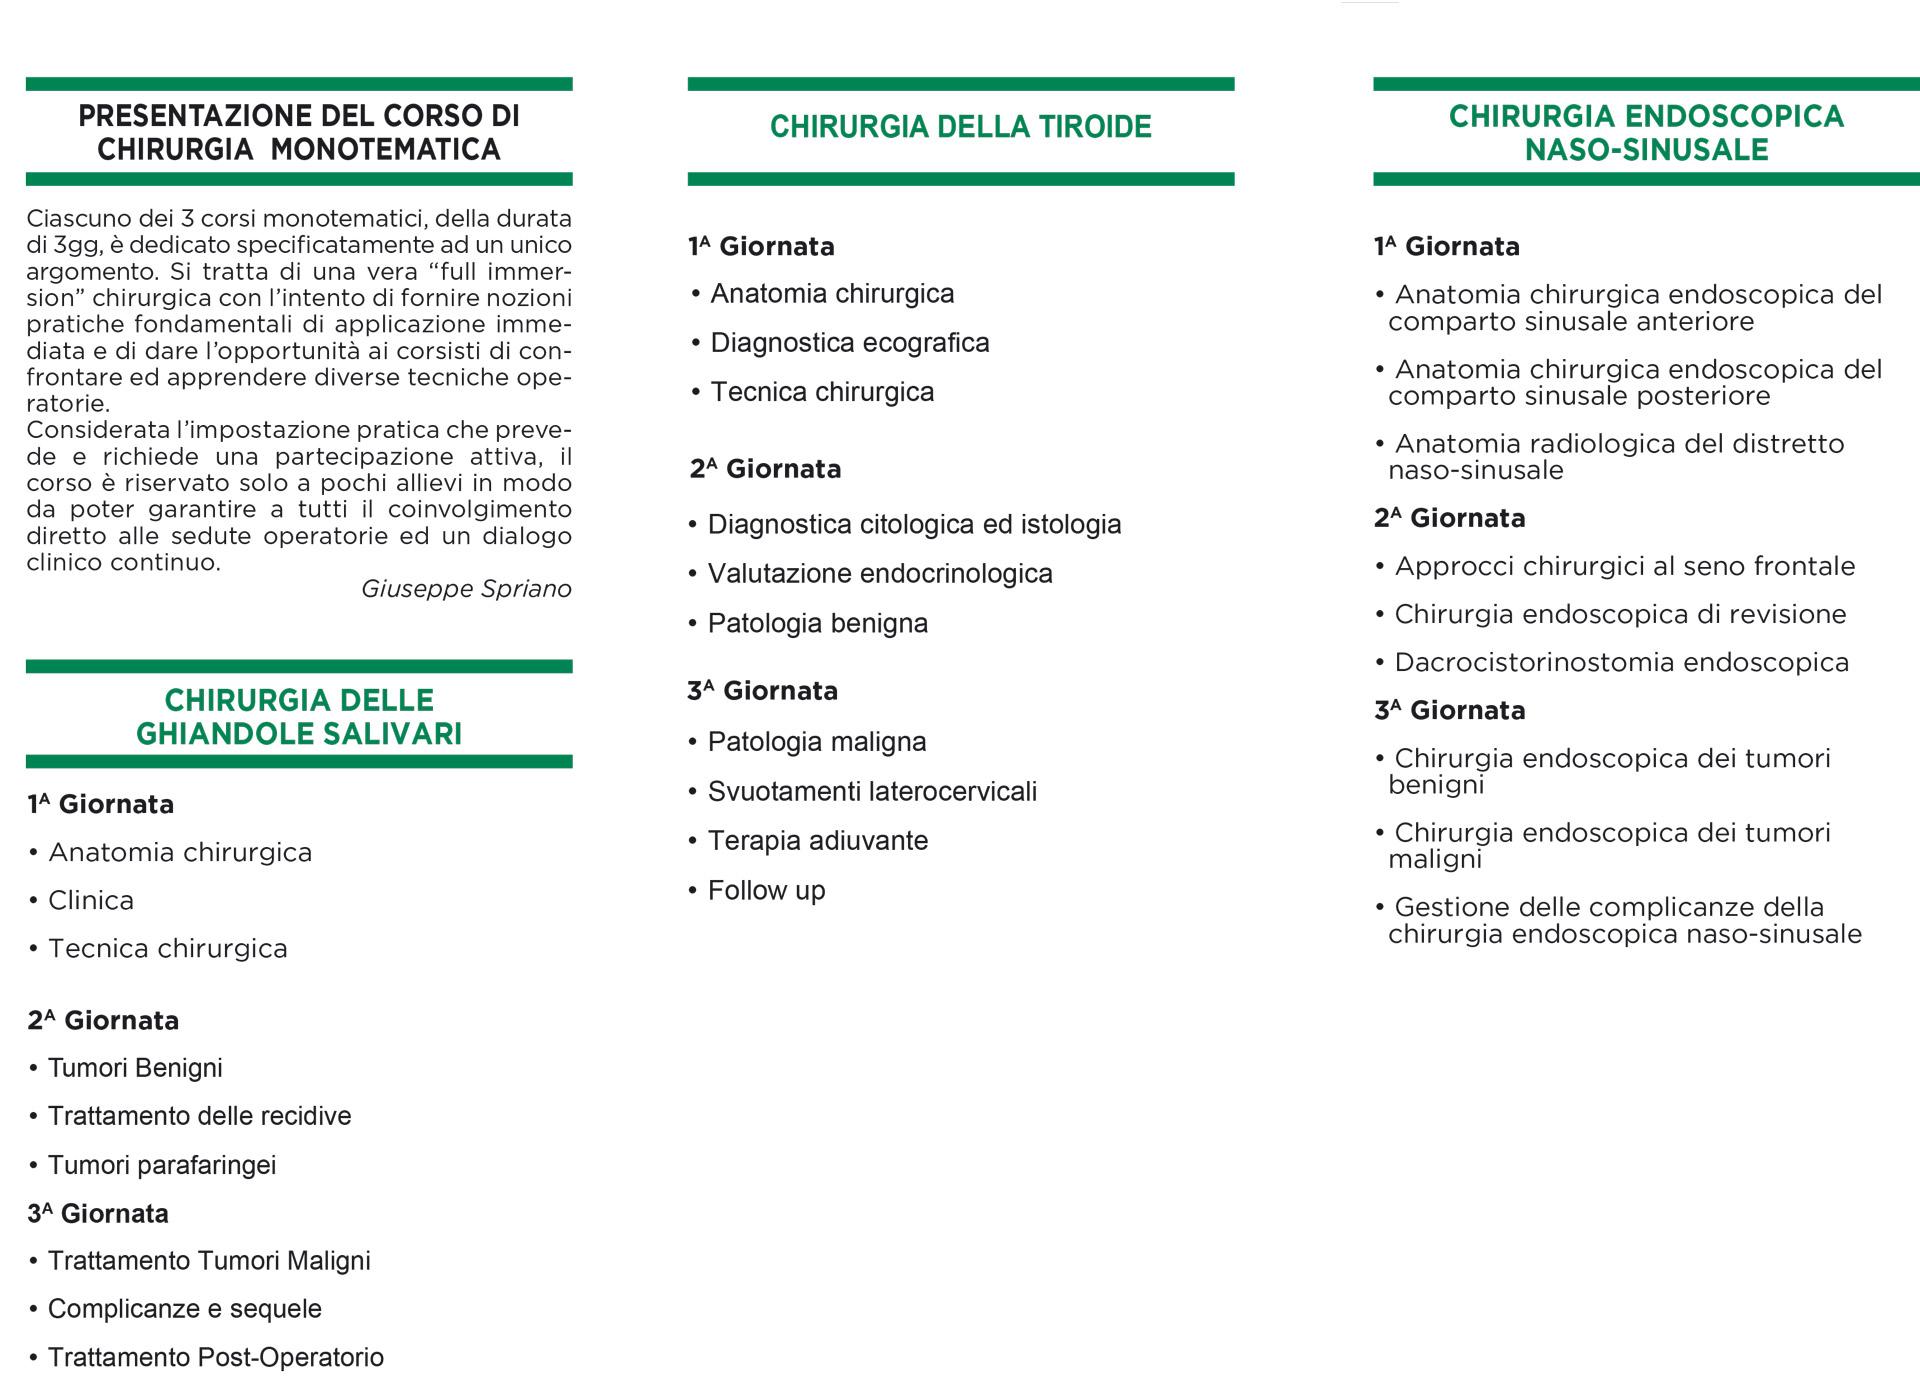 3-humanitas-cori-monotematici2019